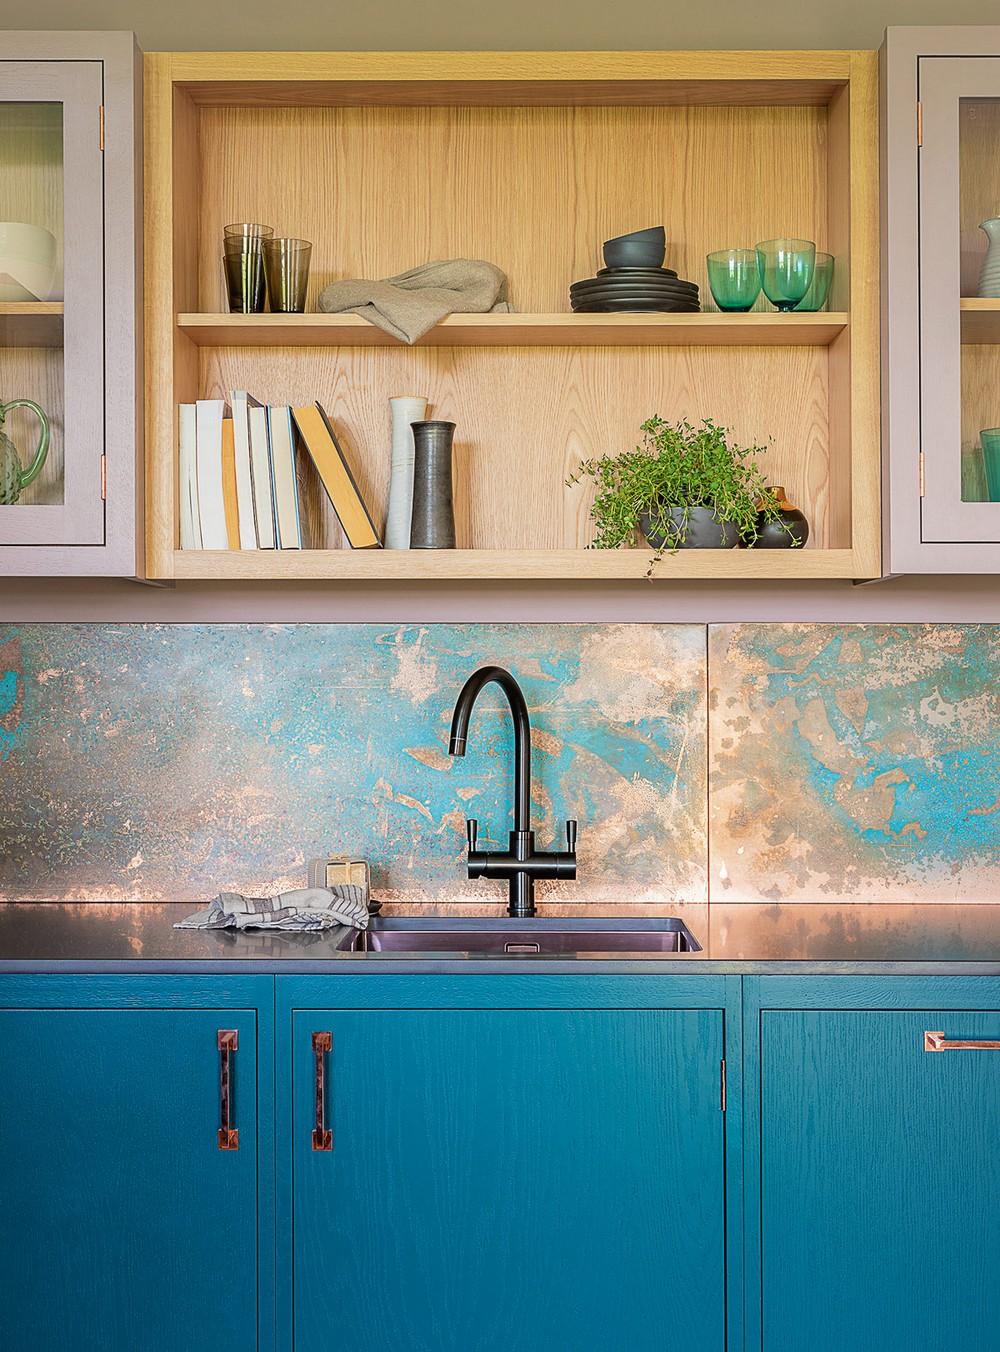 Kitchen Design 6 Exquisite Color Schemes to Complement Your Interior_5 kitchen design Kitchen Design: 6 Exquisite Color Schemes to Complement Your Interior Kitchen Design 6 Exquisite Color Schemes to Complement Your Interior 5